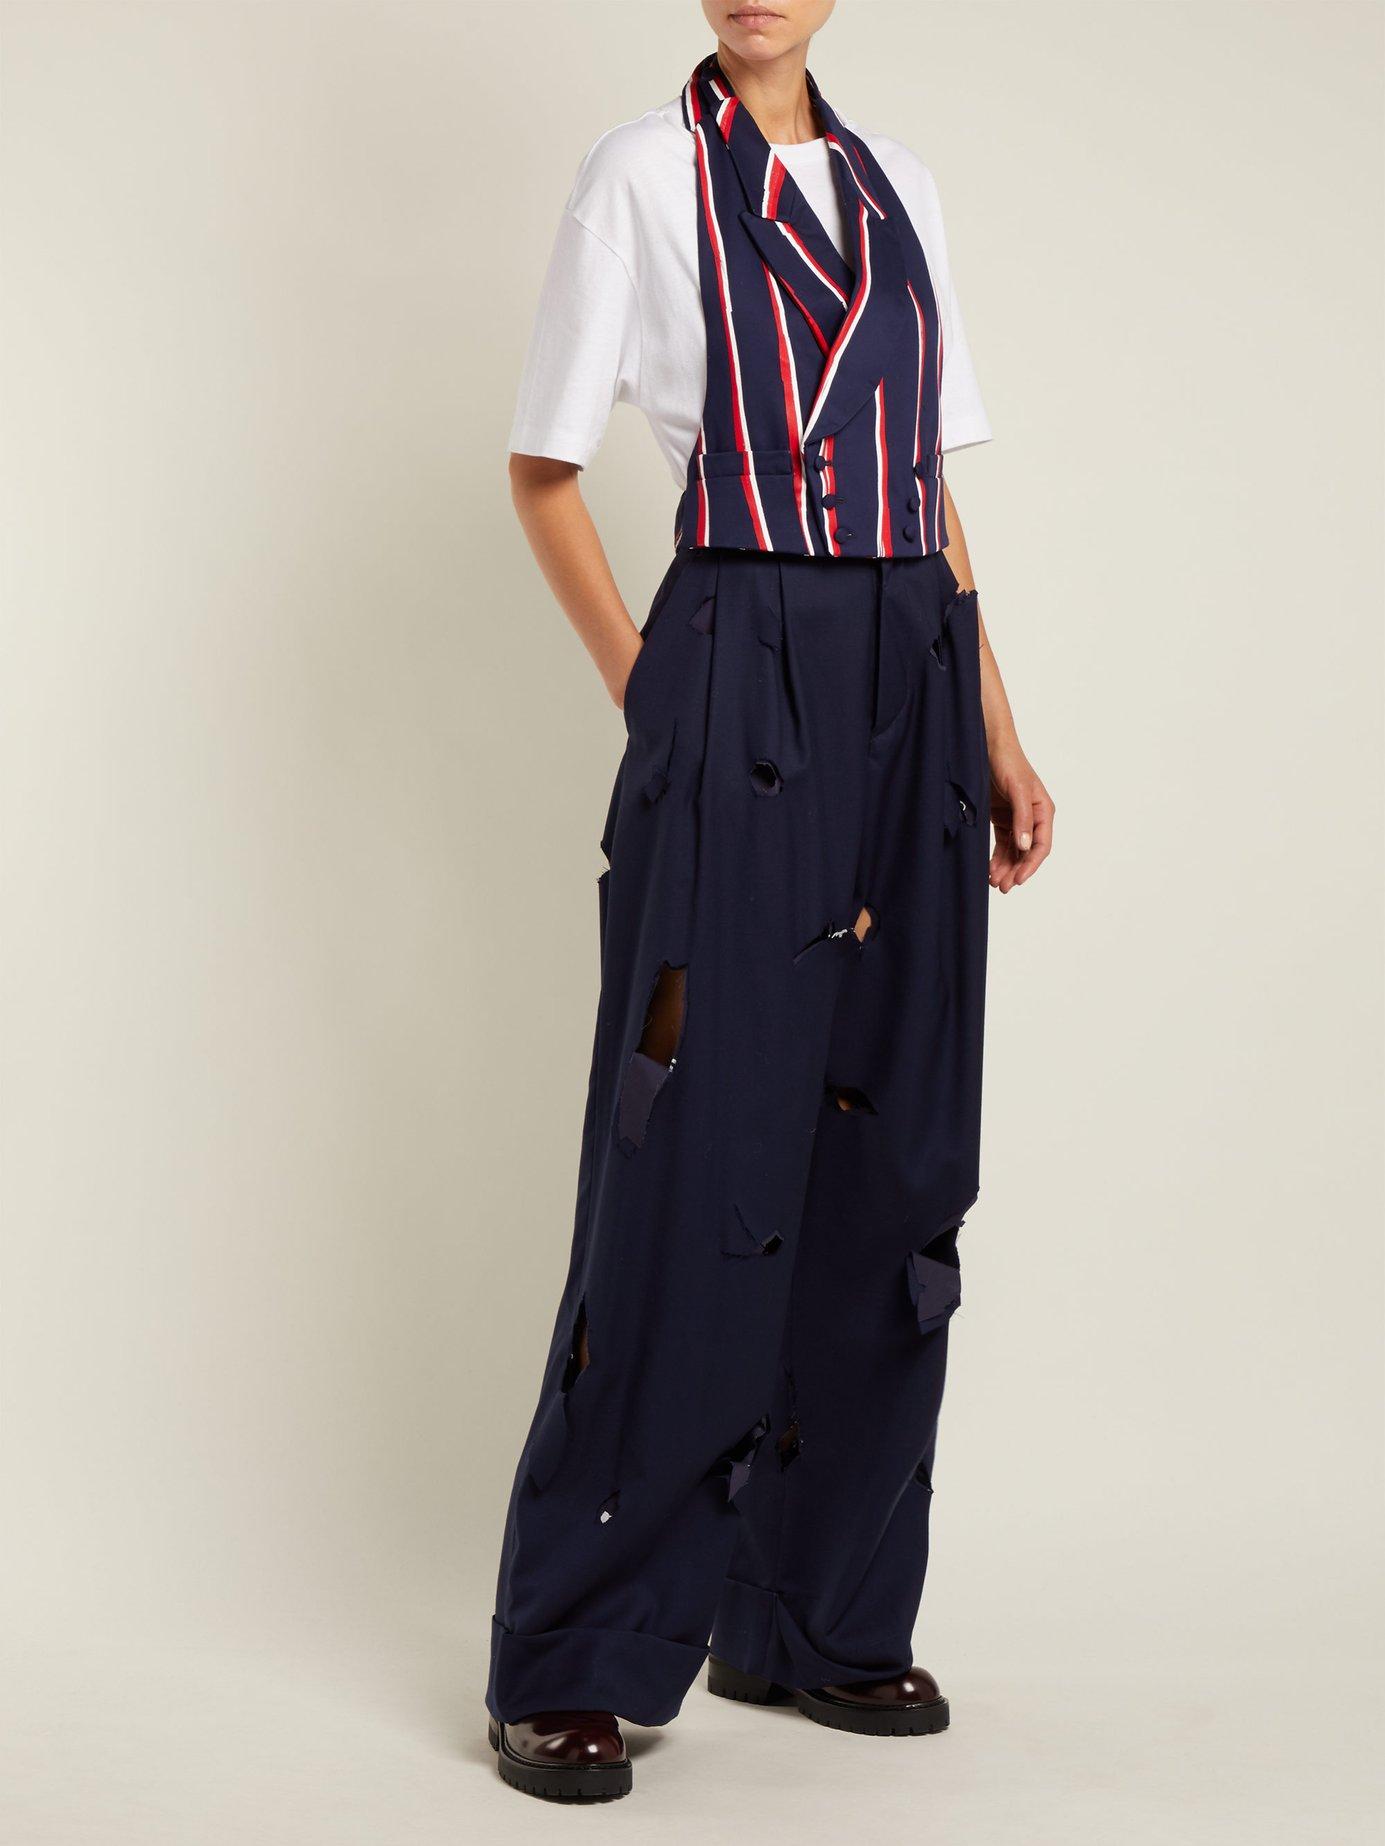 Striped halterneck cotton-twill waistcoat by Charles Jeffrey Loverboy